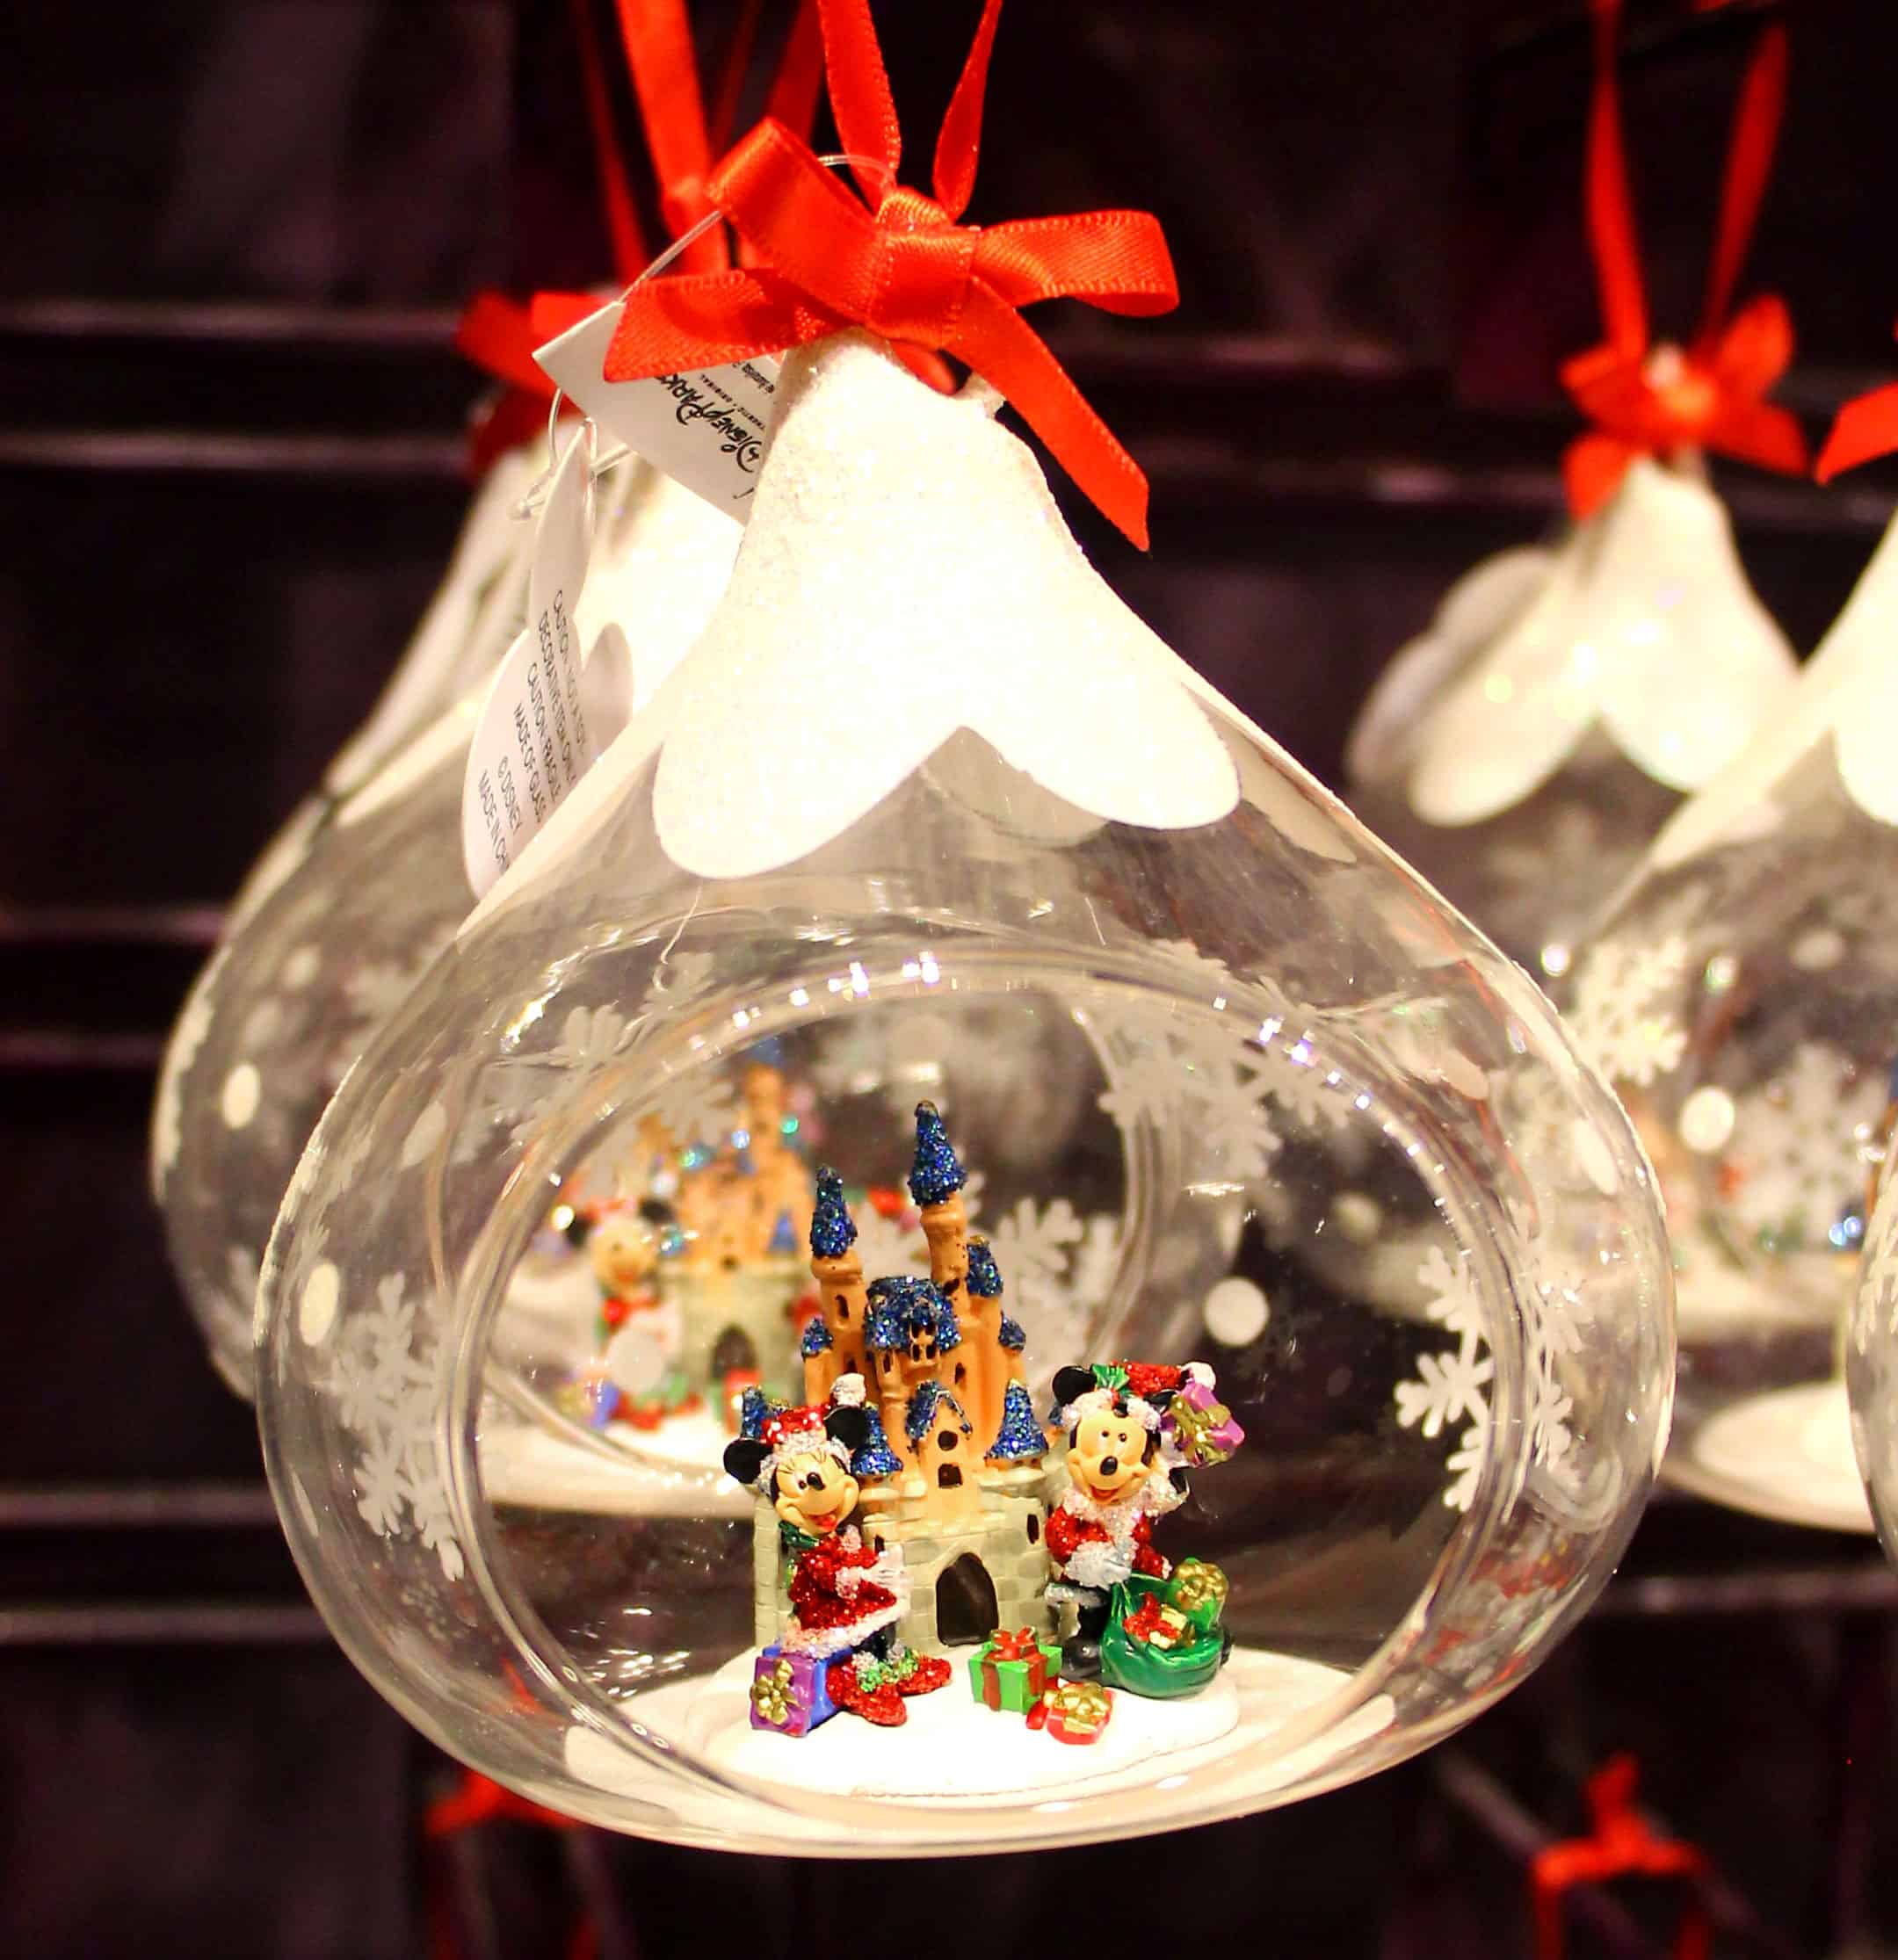 Weihnachtskugeln Comic - Baumkugeln mit beliebten Comicfiguren